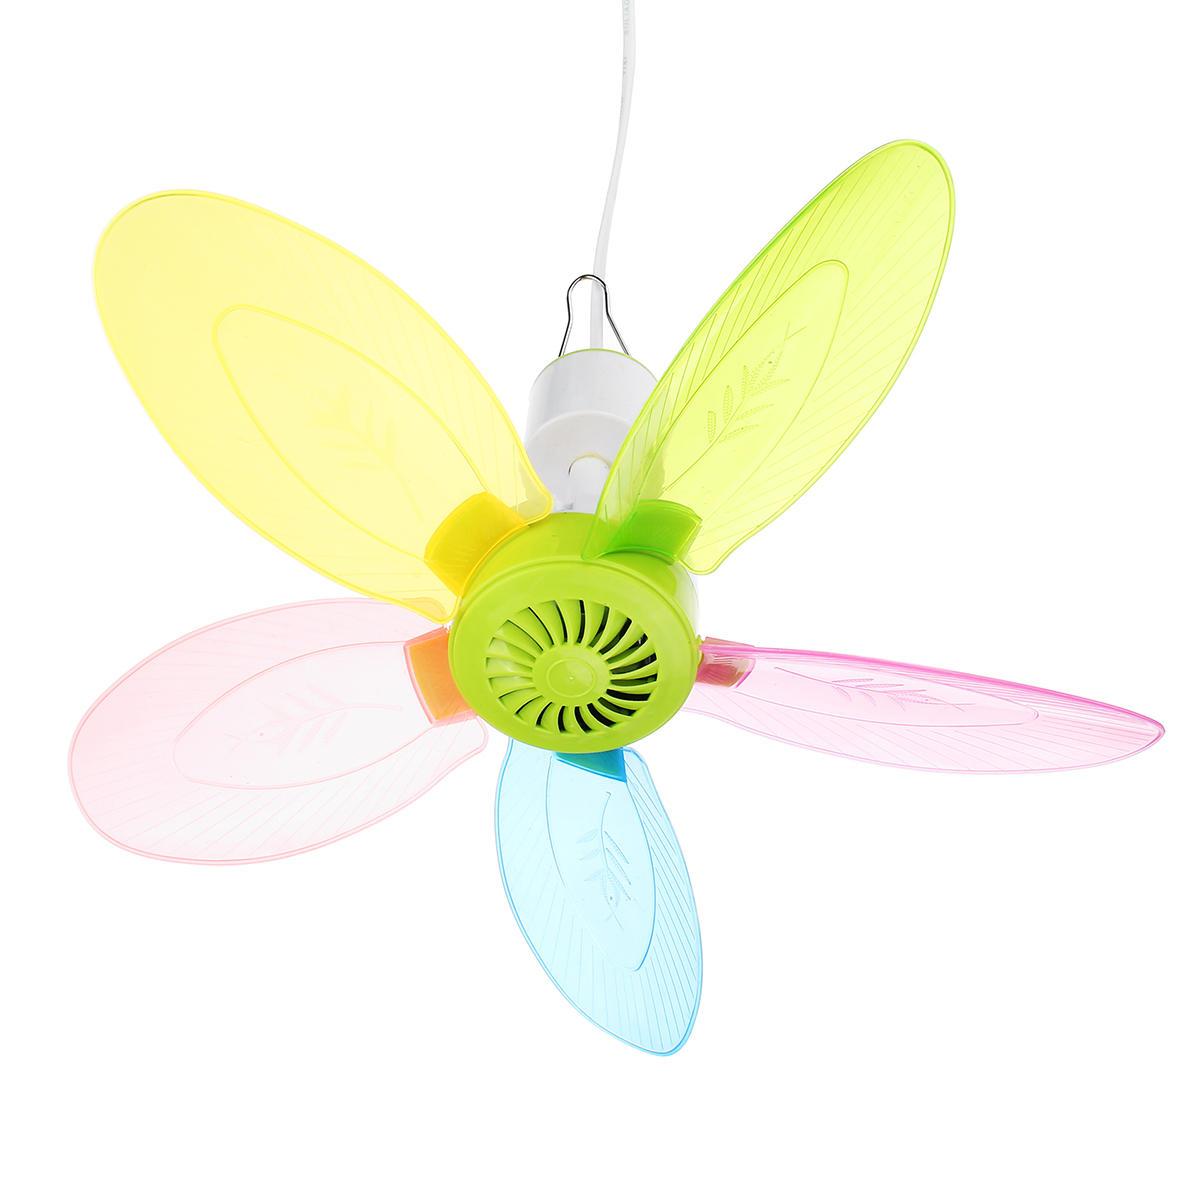 9W Colofful Silent Mini Portable Ceiling Fans Mosquito Net Electric Fan